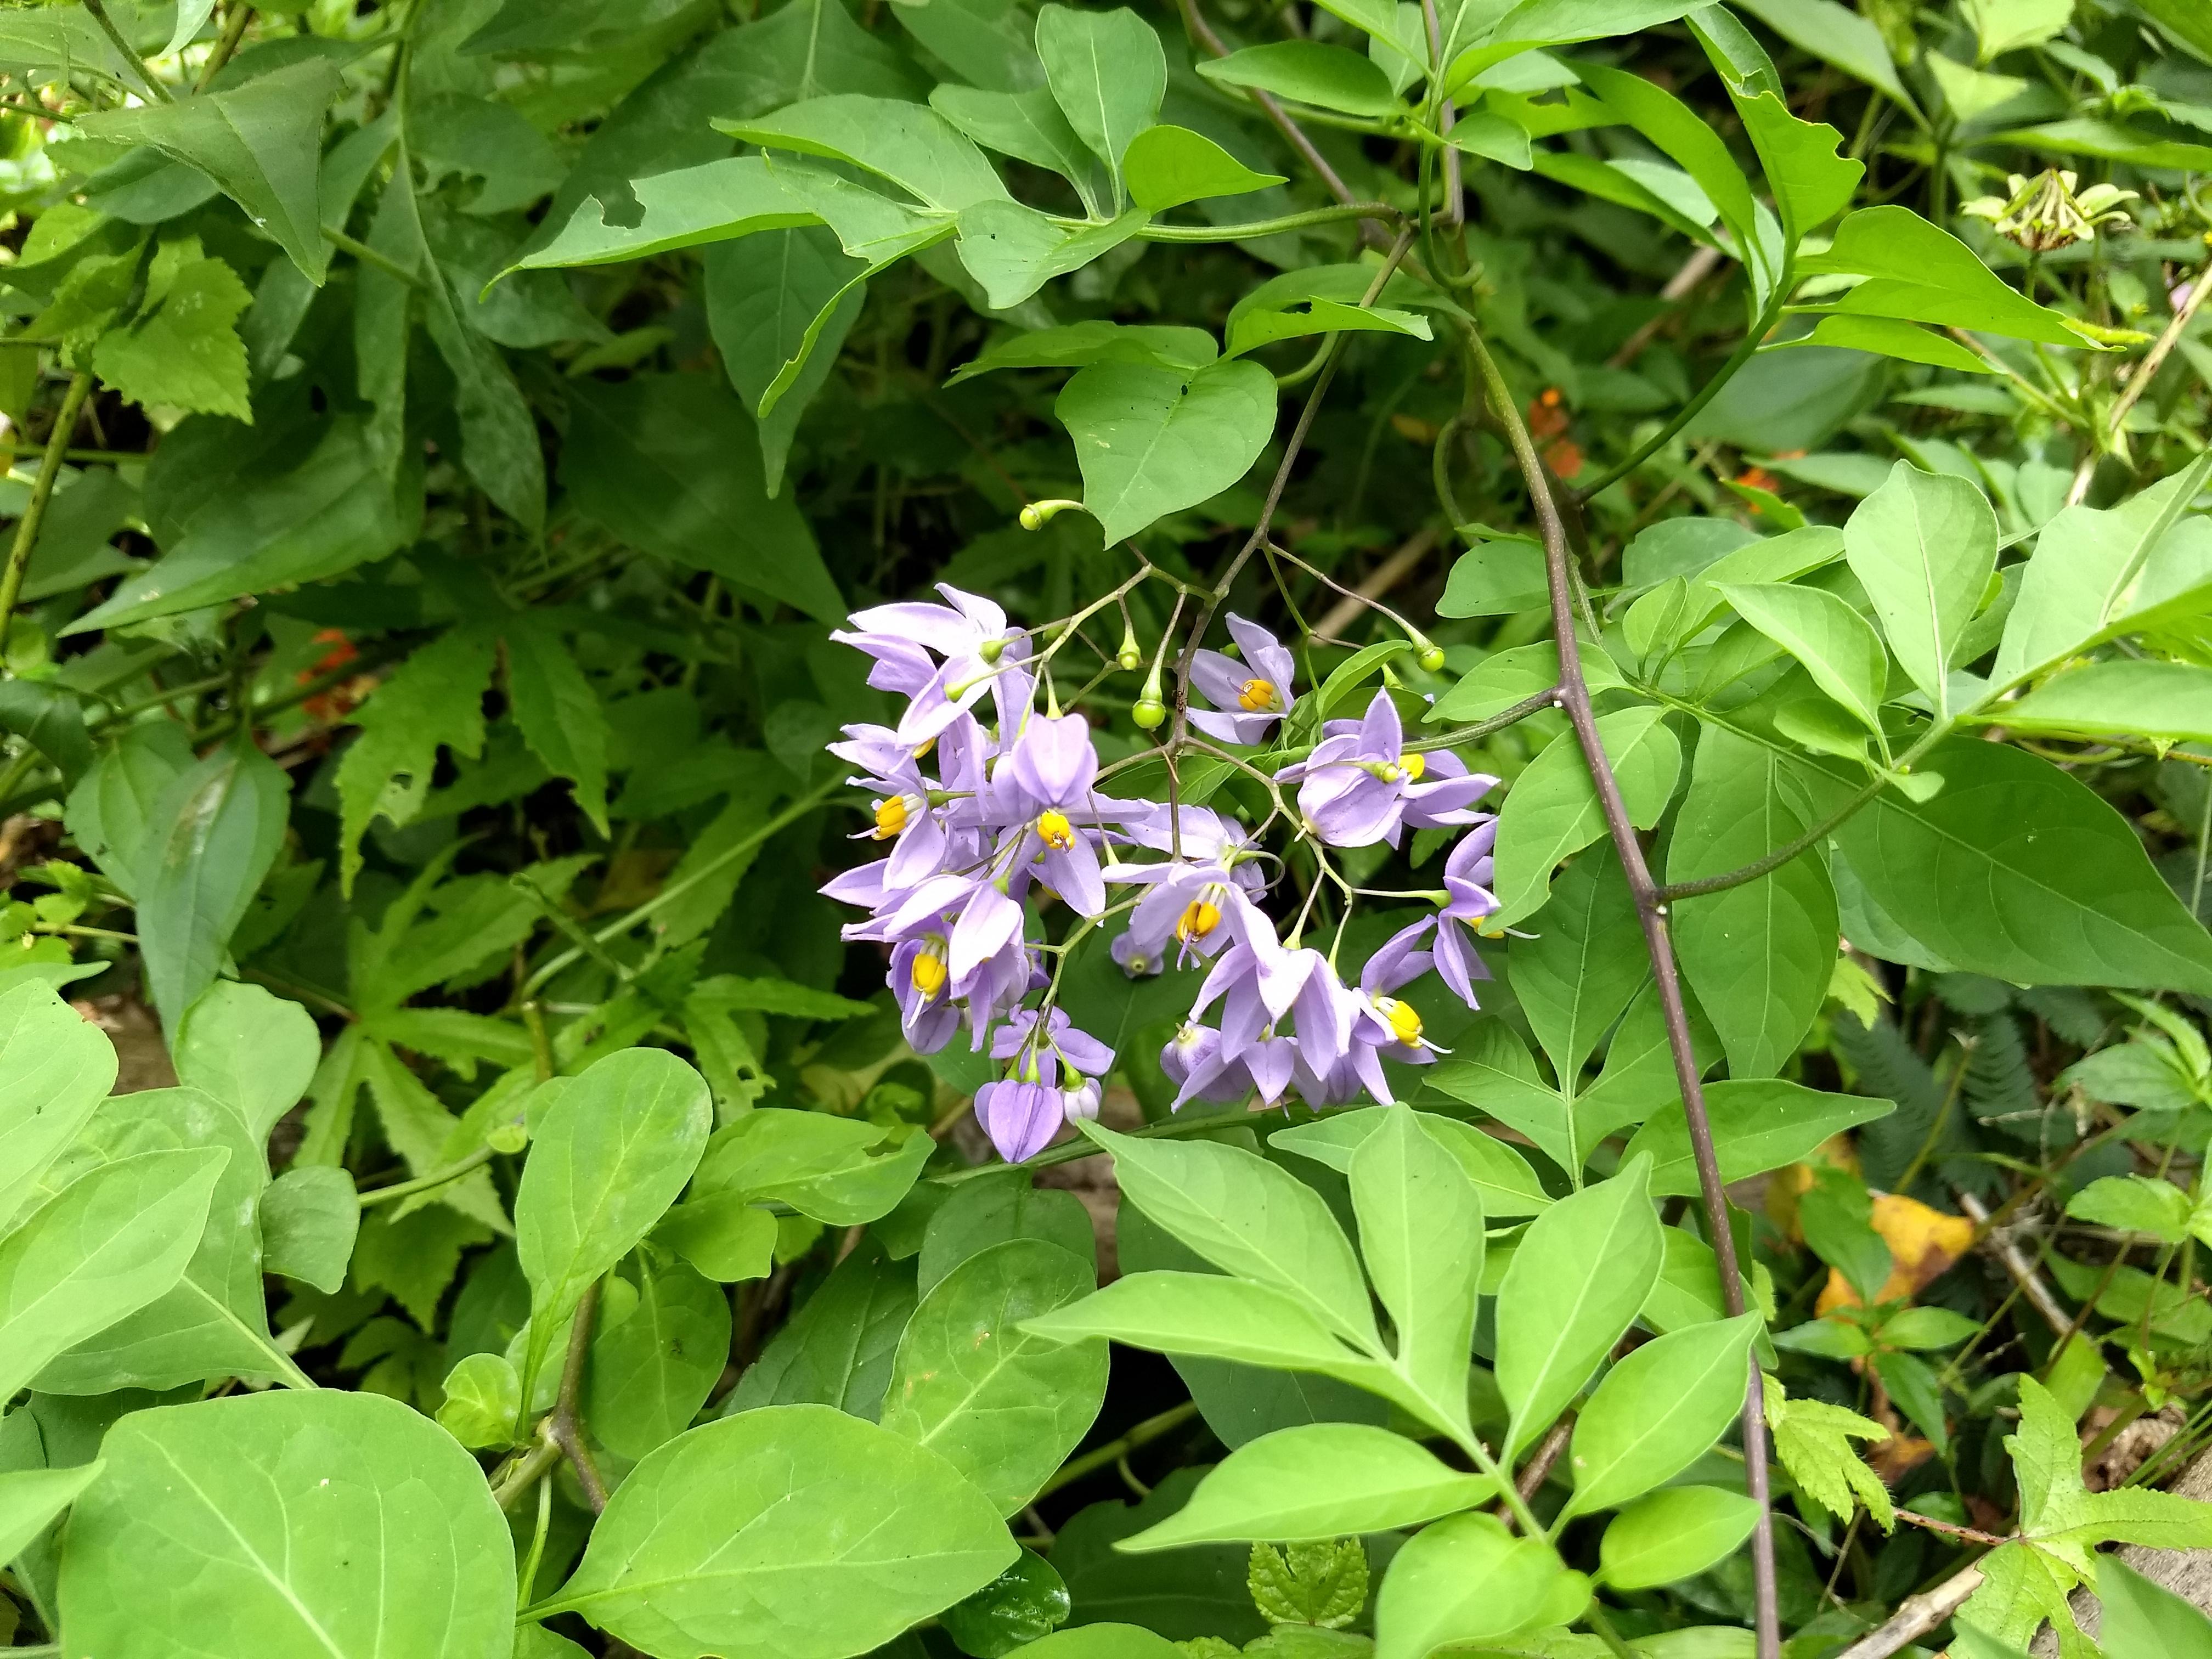 Filesolanum seaforthianum brazilian filesolanum seaforthianum brazilian nightshade italian jasmine potato creeper izmirmasajfo